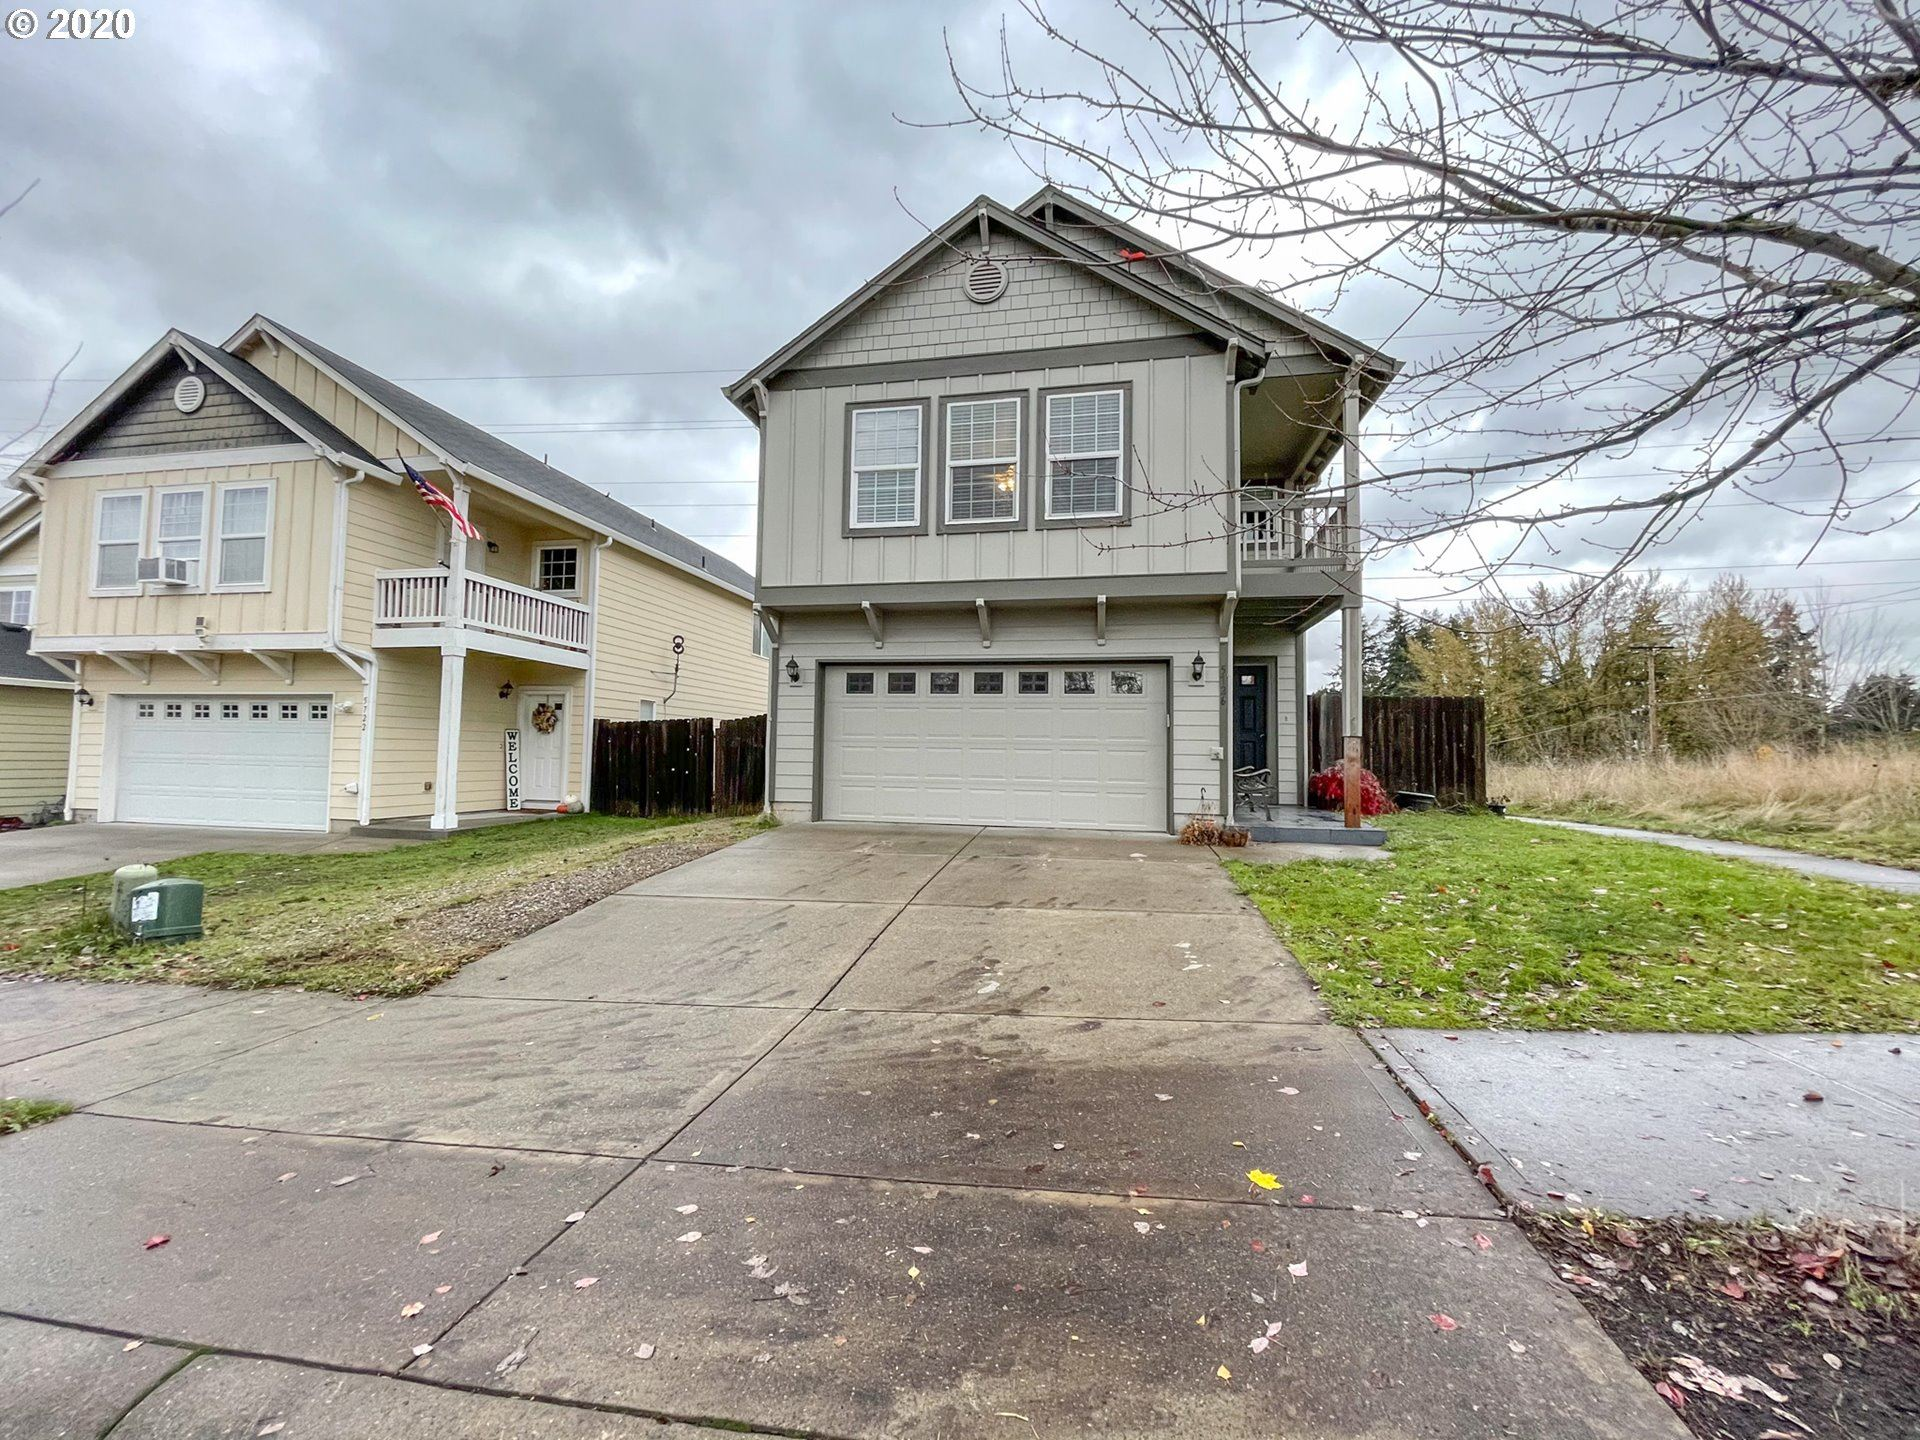 Photo for 5726 NE 64TH ST, Vancouver, WA 98661 (MLS # 20697649)